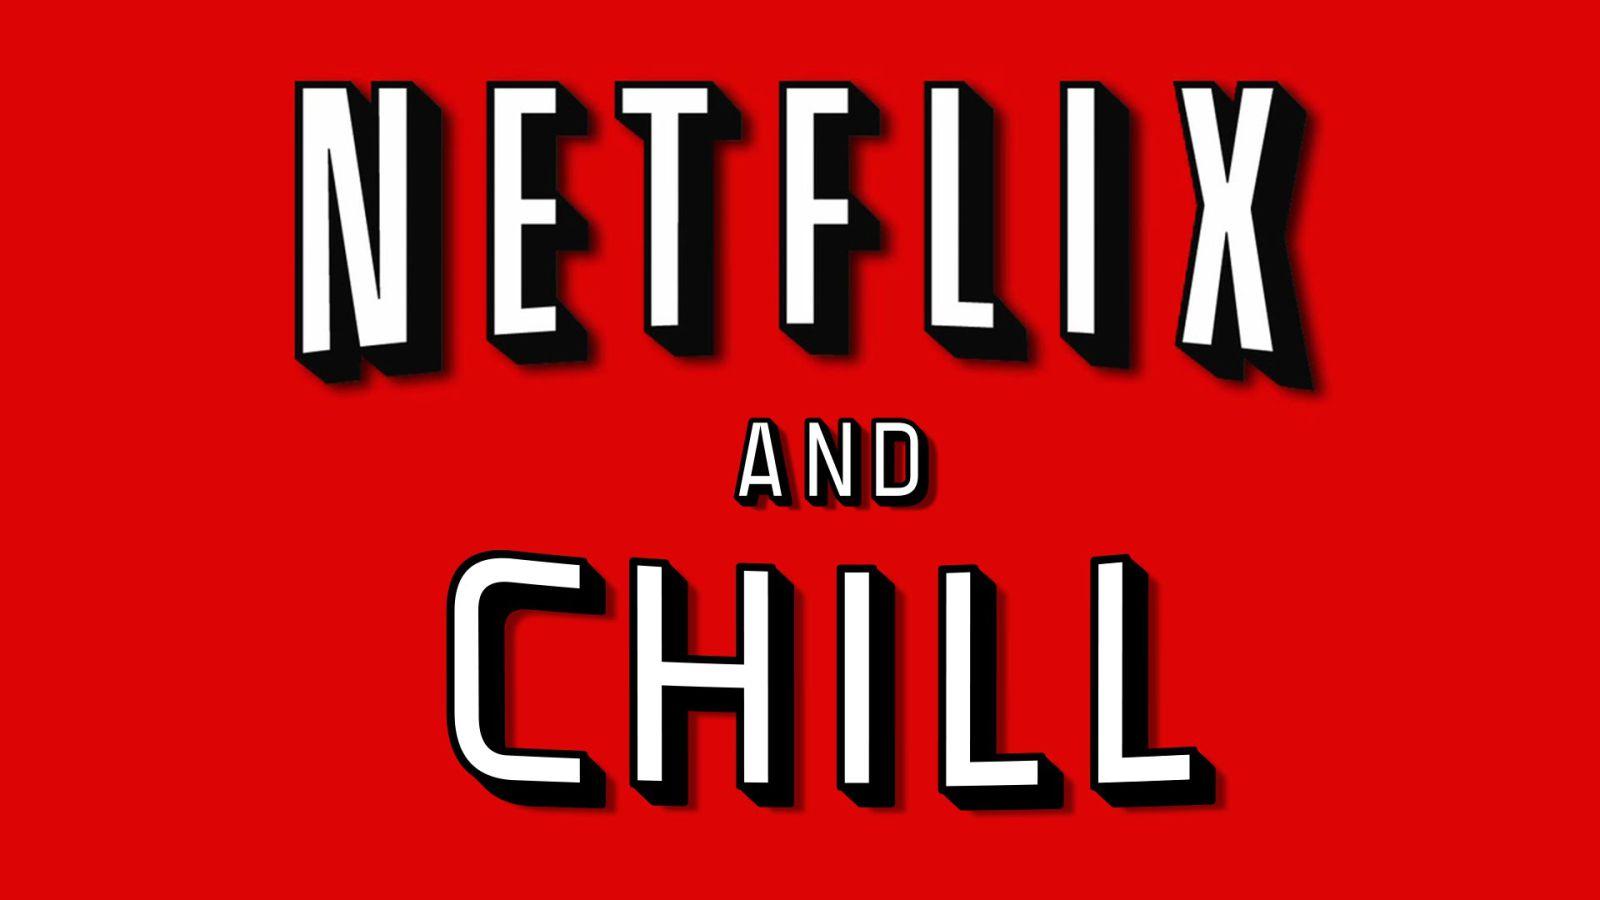 NetflixAndChill